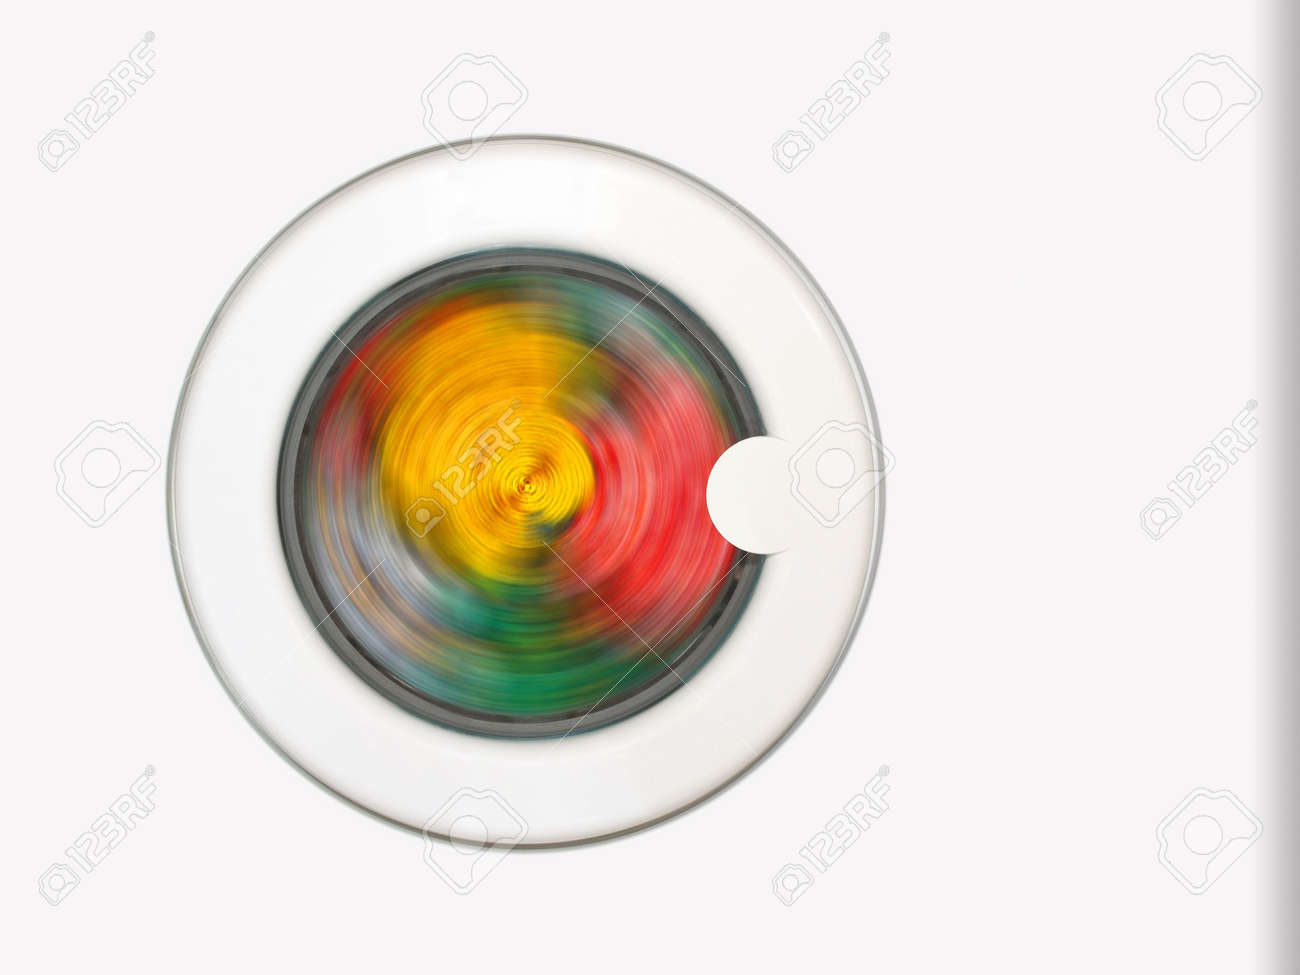 Colorful clothing in washing machine Stock Photo - 769442